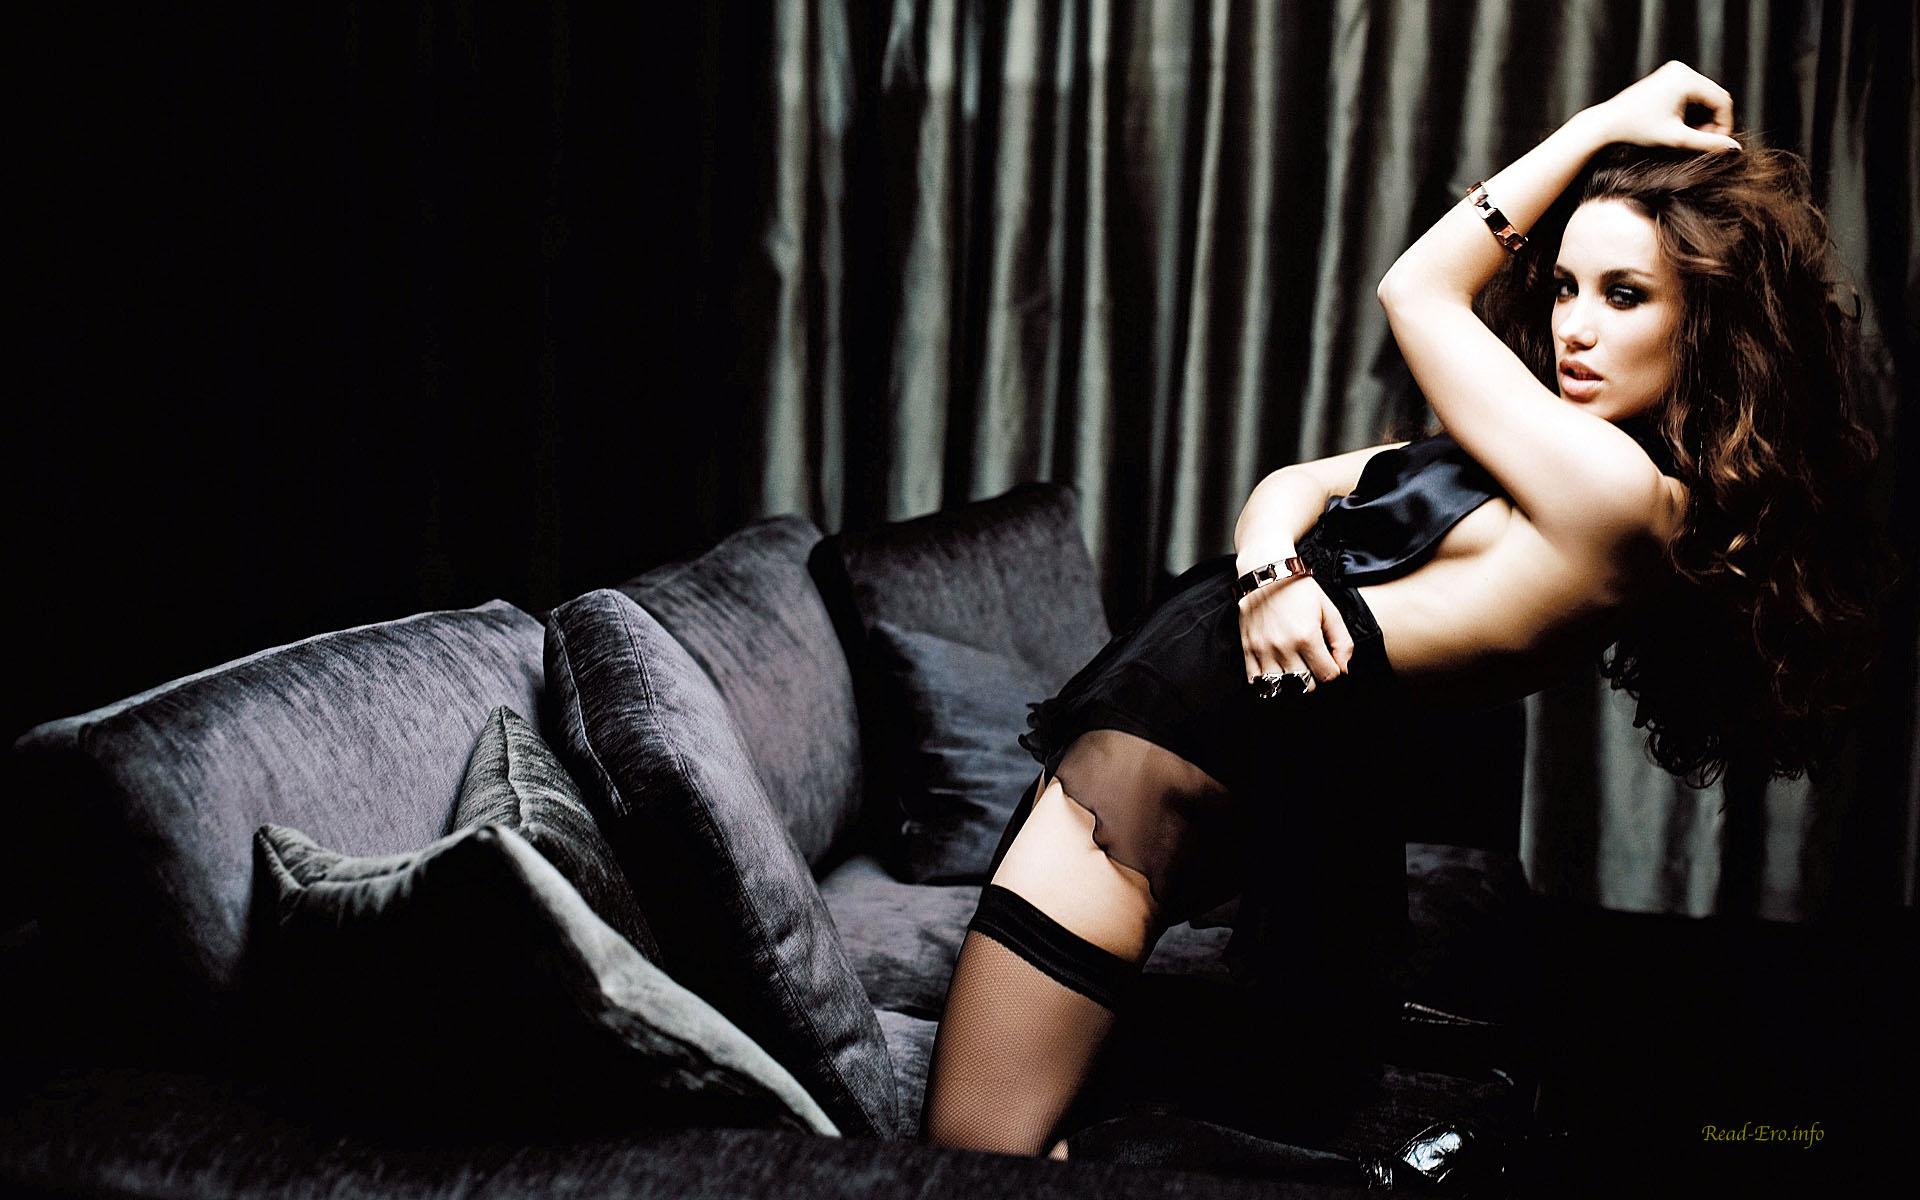 samie-seksualnie-foto-viktorii-dayneko